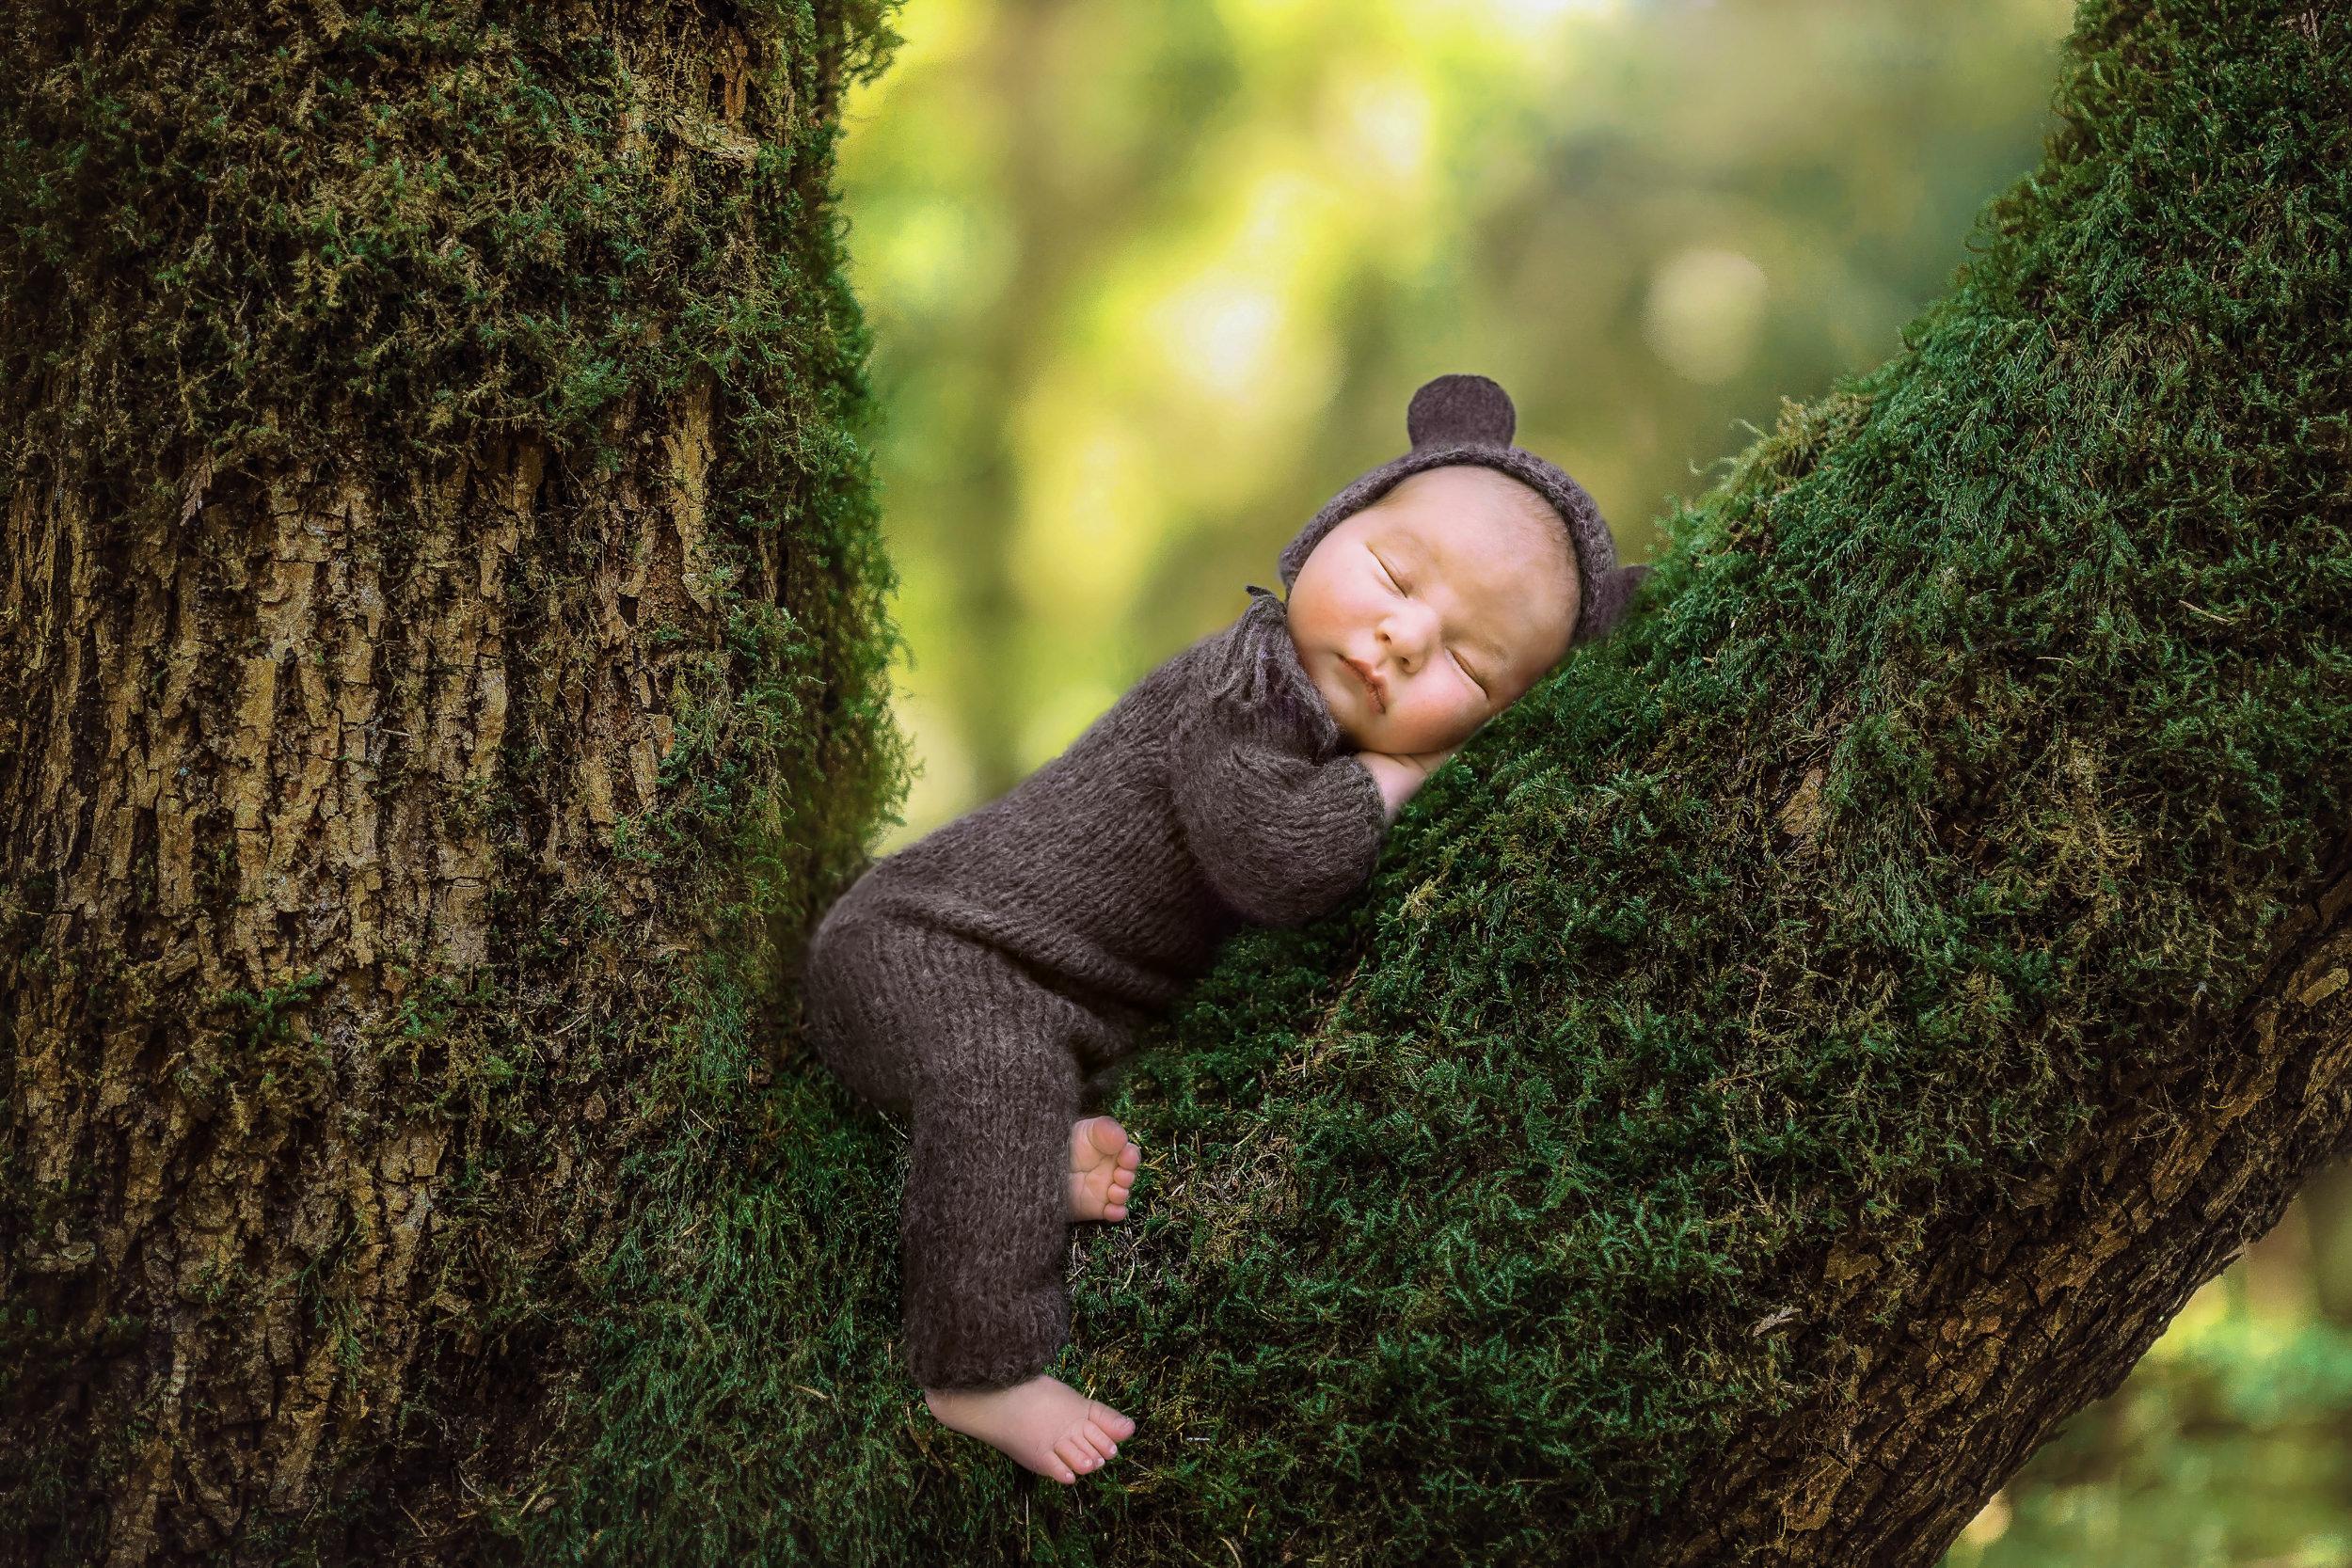 DFW-newborn-photographer-Stacie-Dugas-2.jpg